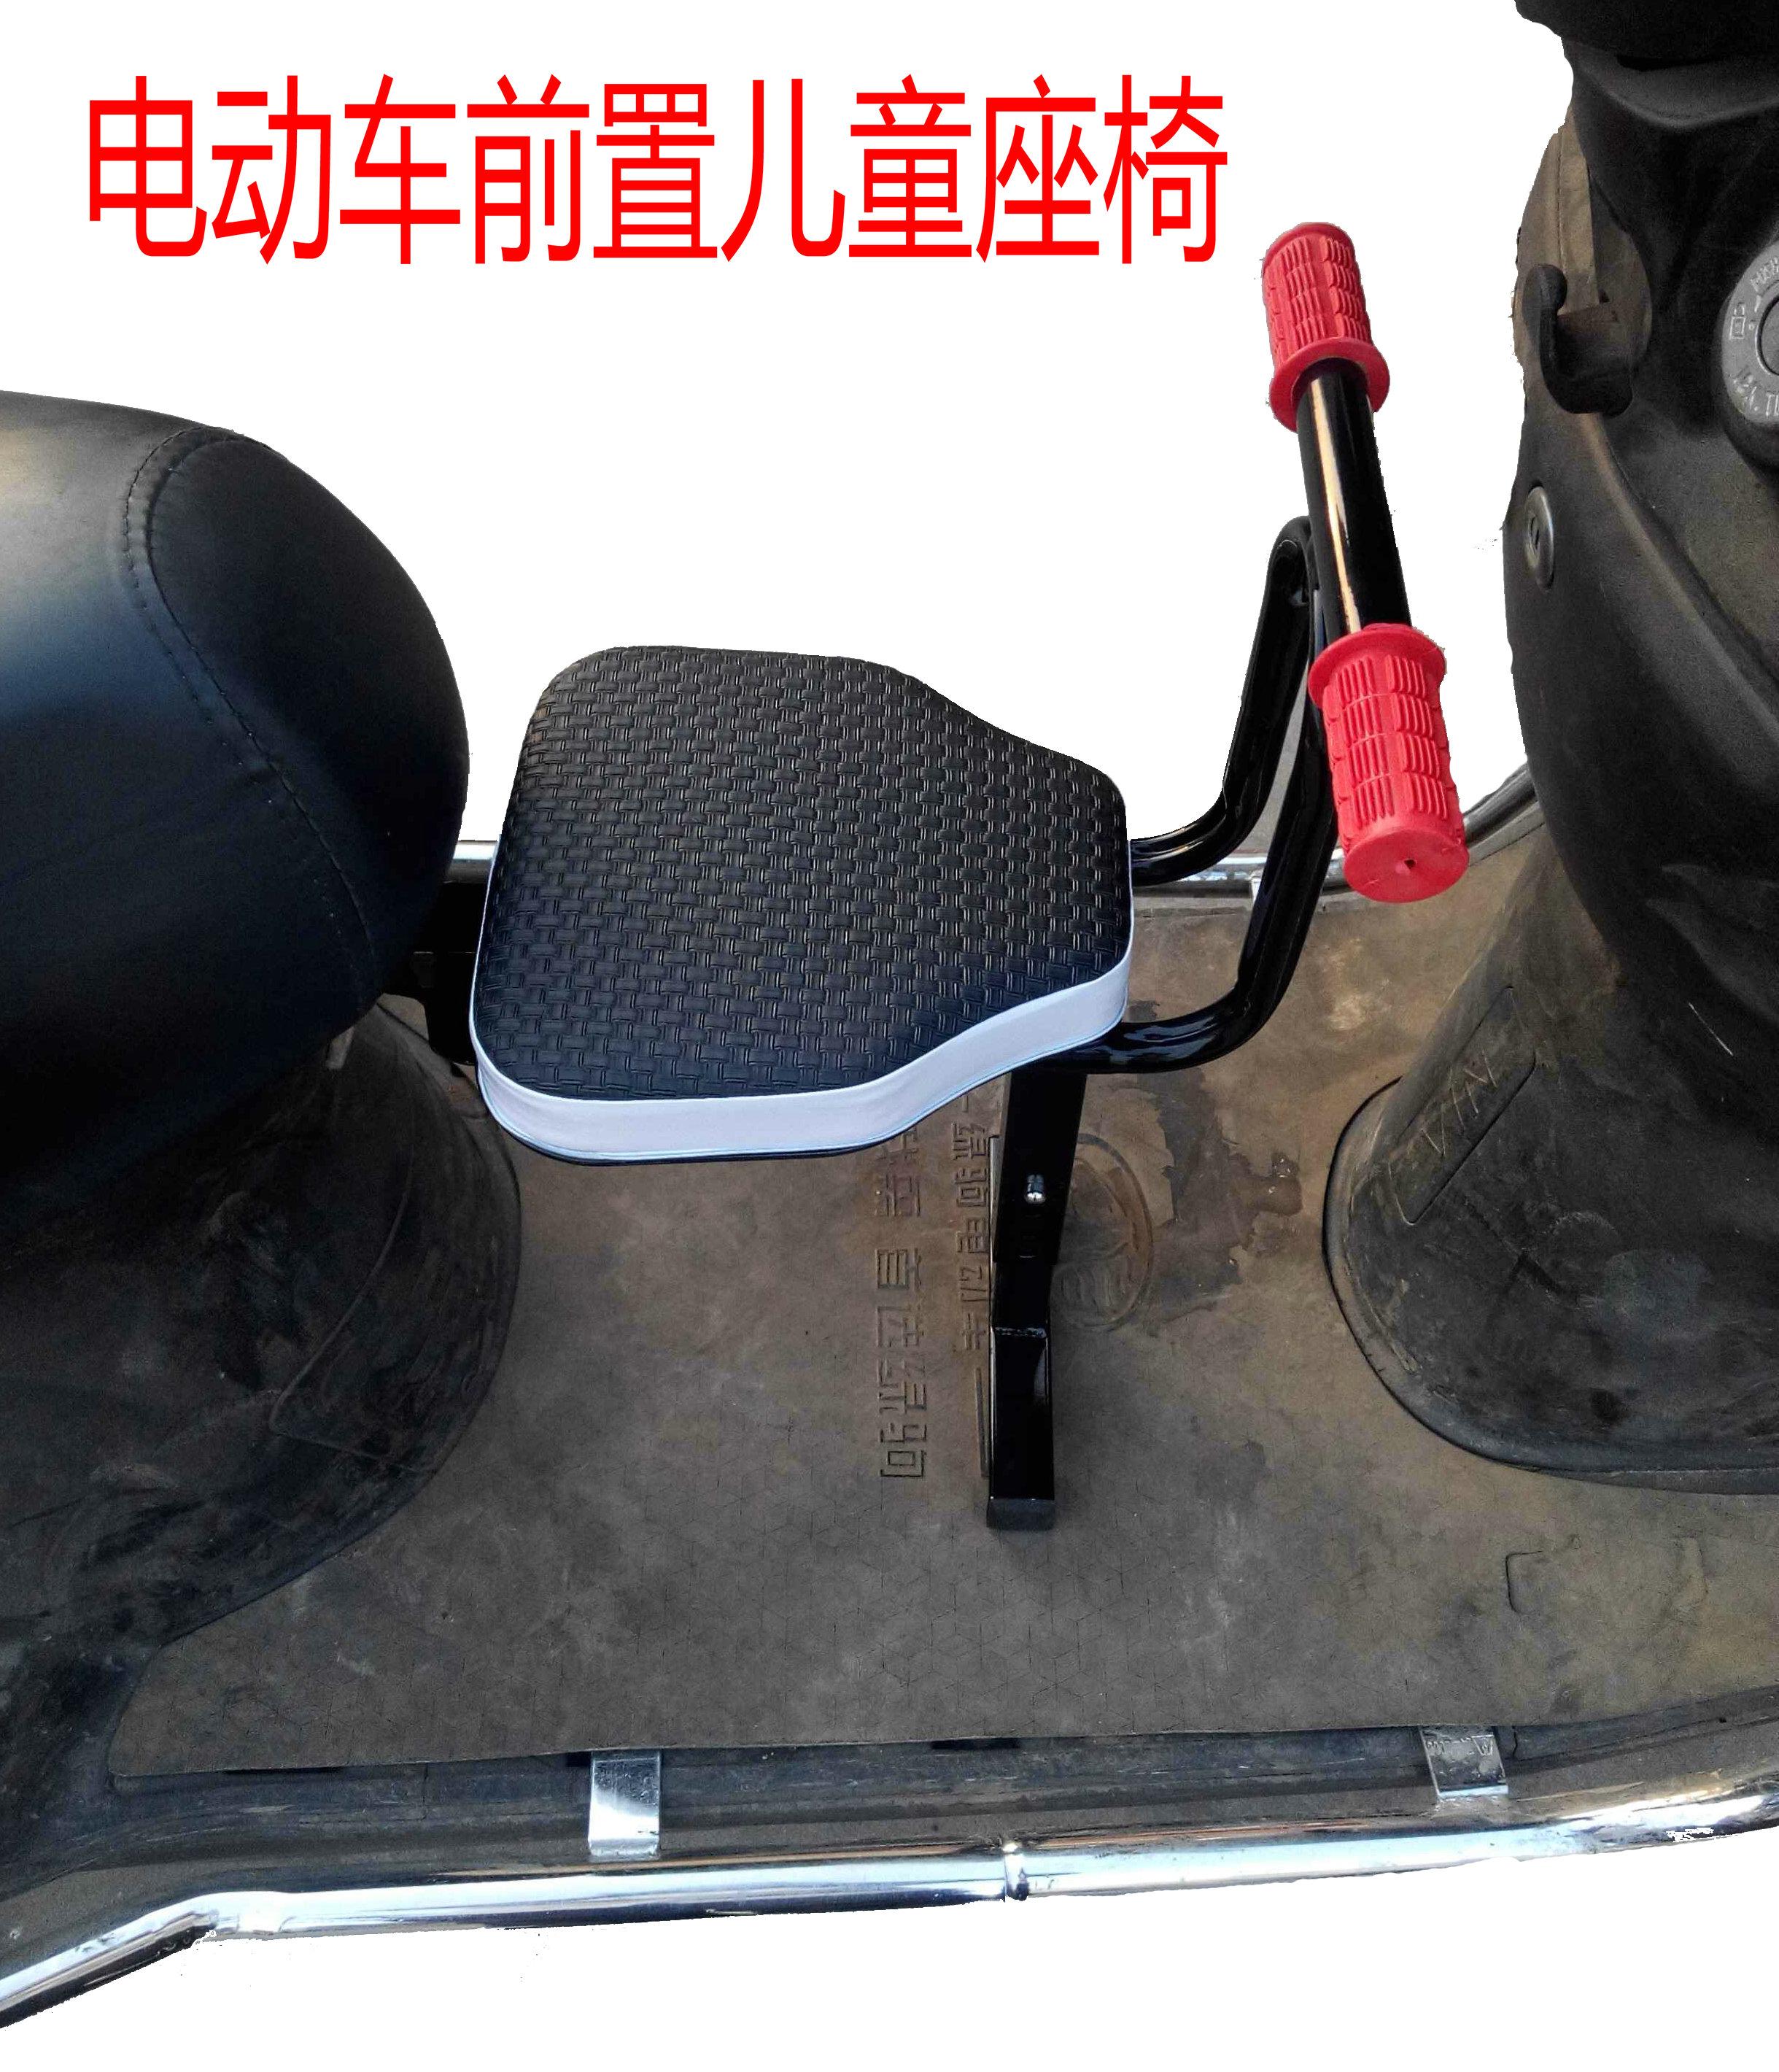 Скутер мотоцикл черепаха король электромобиль мощность автомобиль электрический бутылка автомобиль ребенок передний сиденье ребенок безопасность сиденье